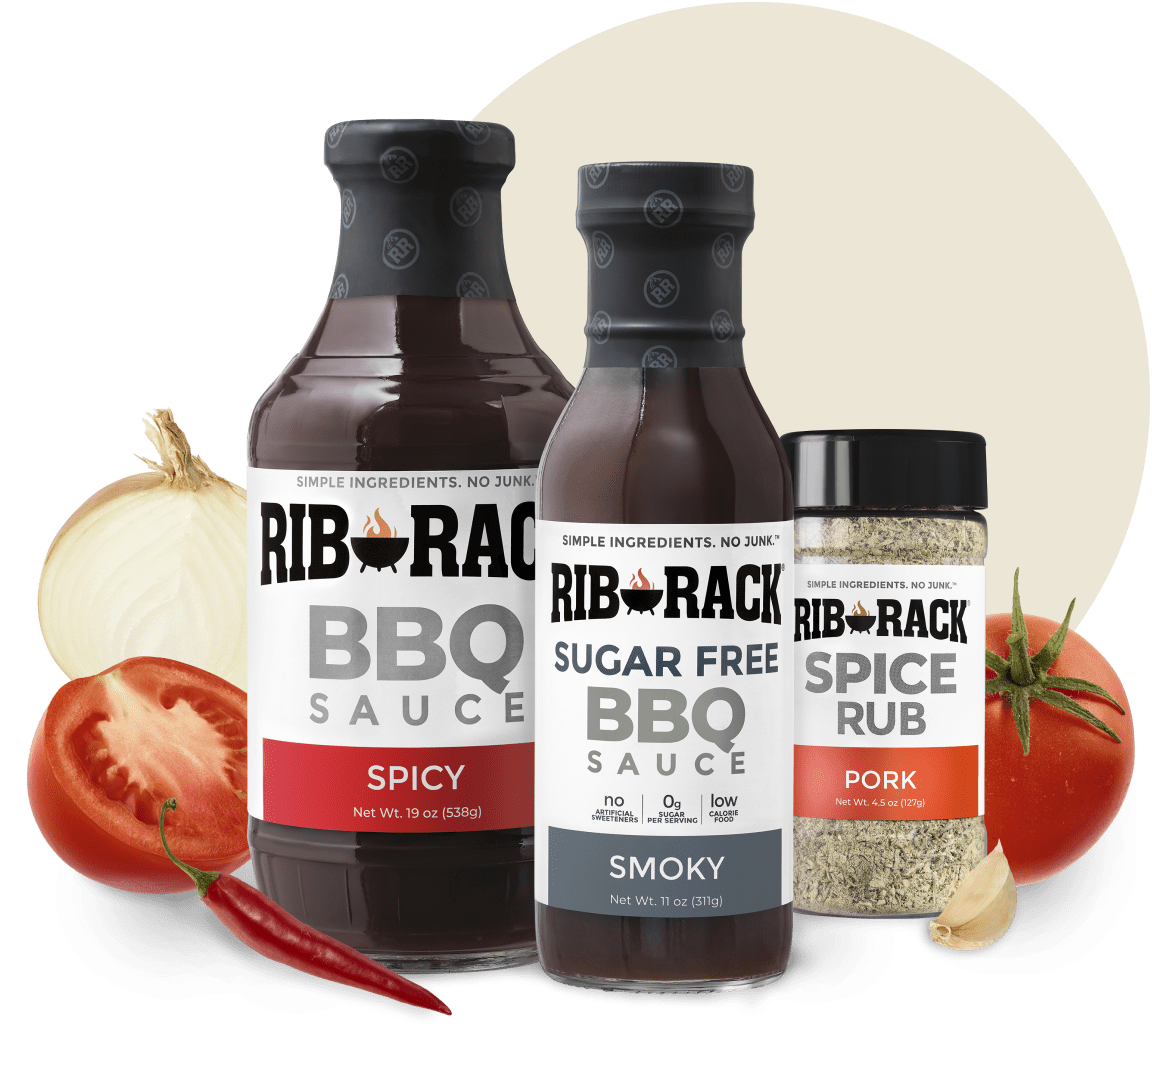 Bottle of Rib Rack Original BBQ Sauce